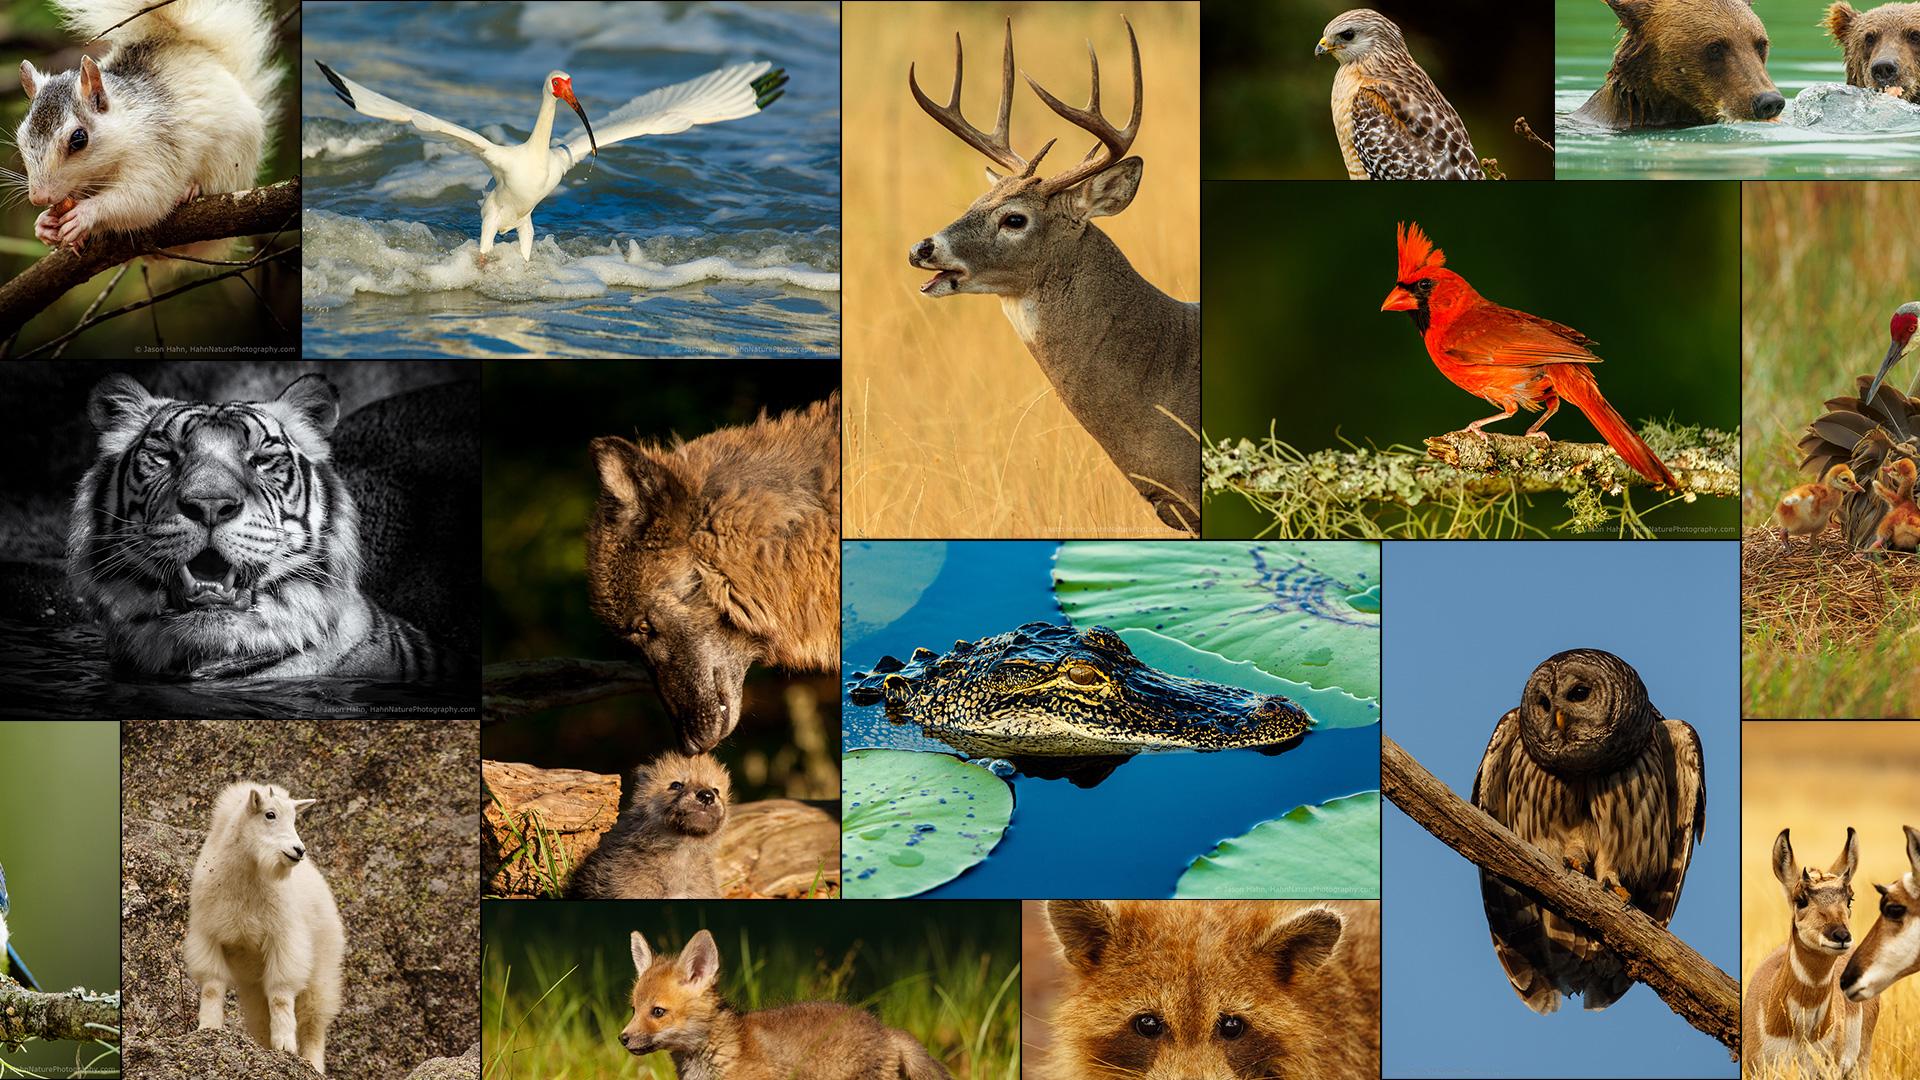 wildlife-up-close-Featured-Image2